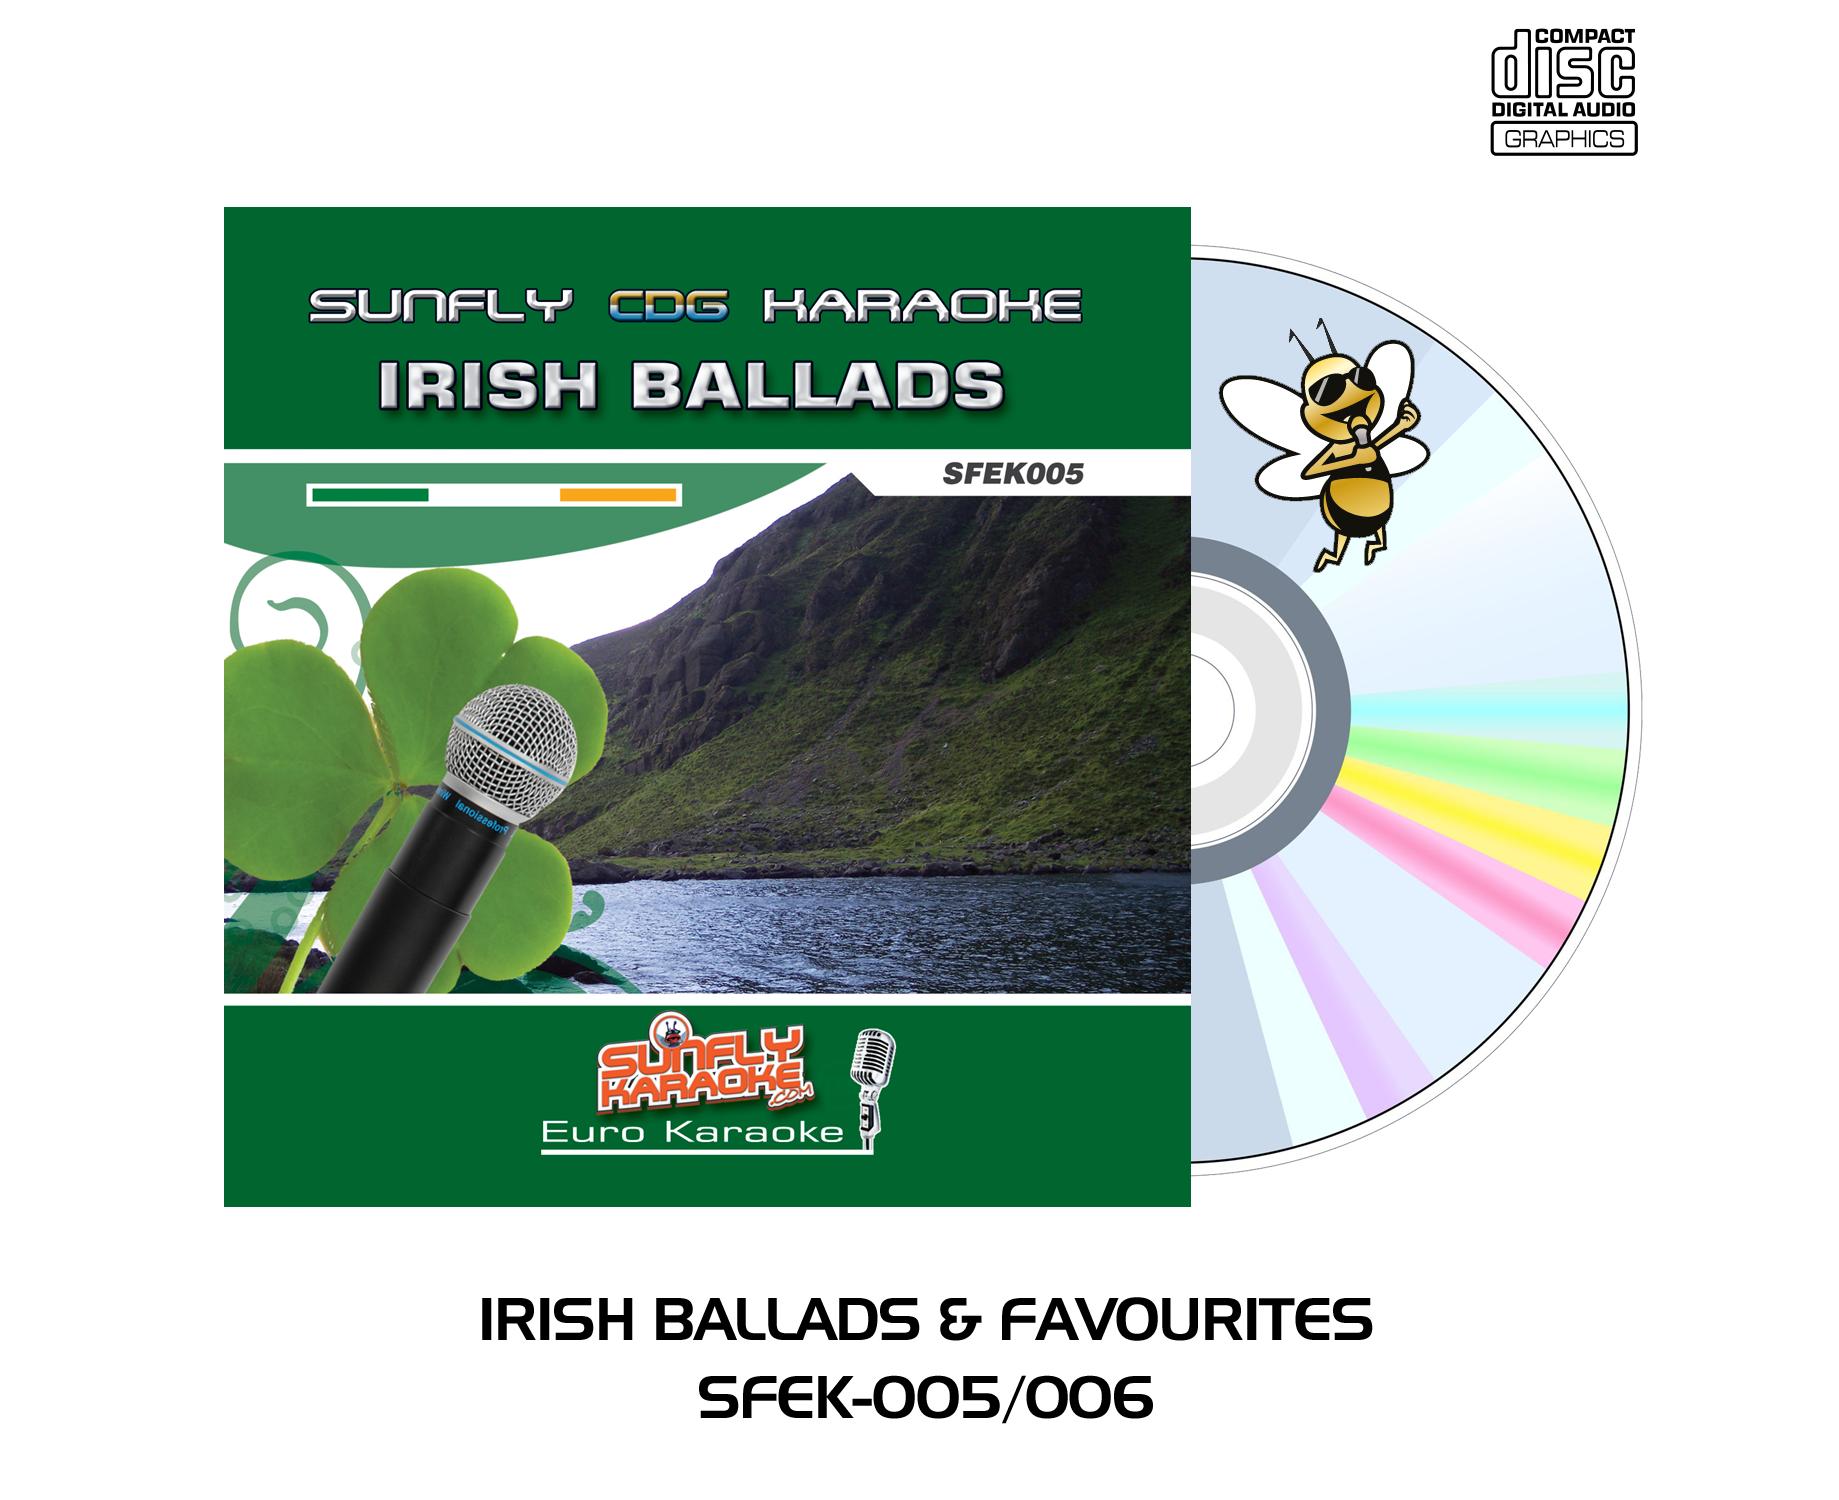 Irish Ballads & Favourites - 2 Disc Set - Sunfly Karaoke - CD+G